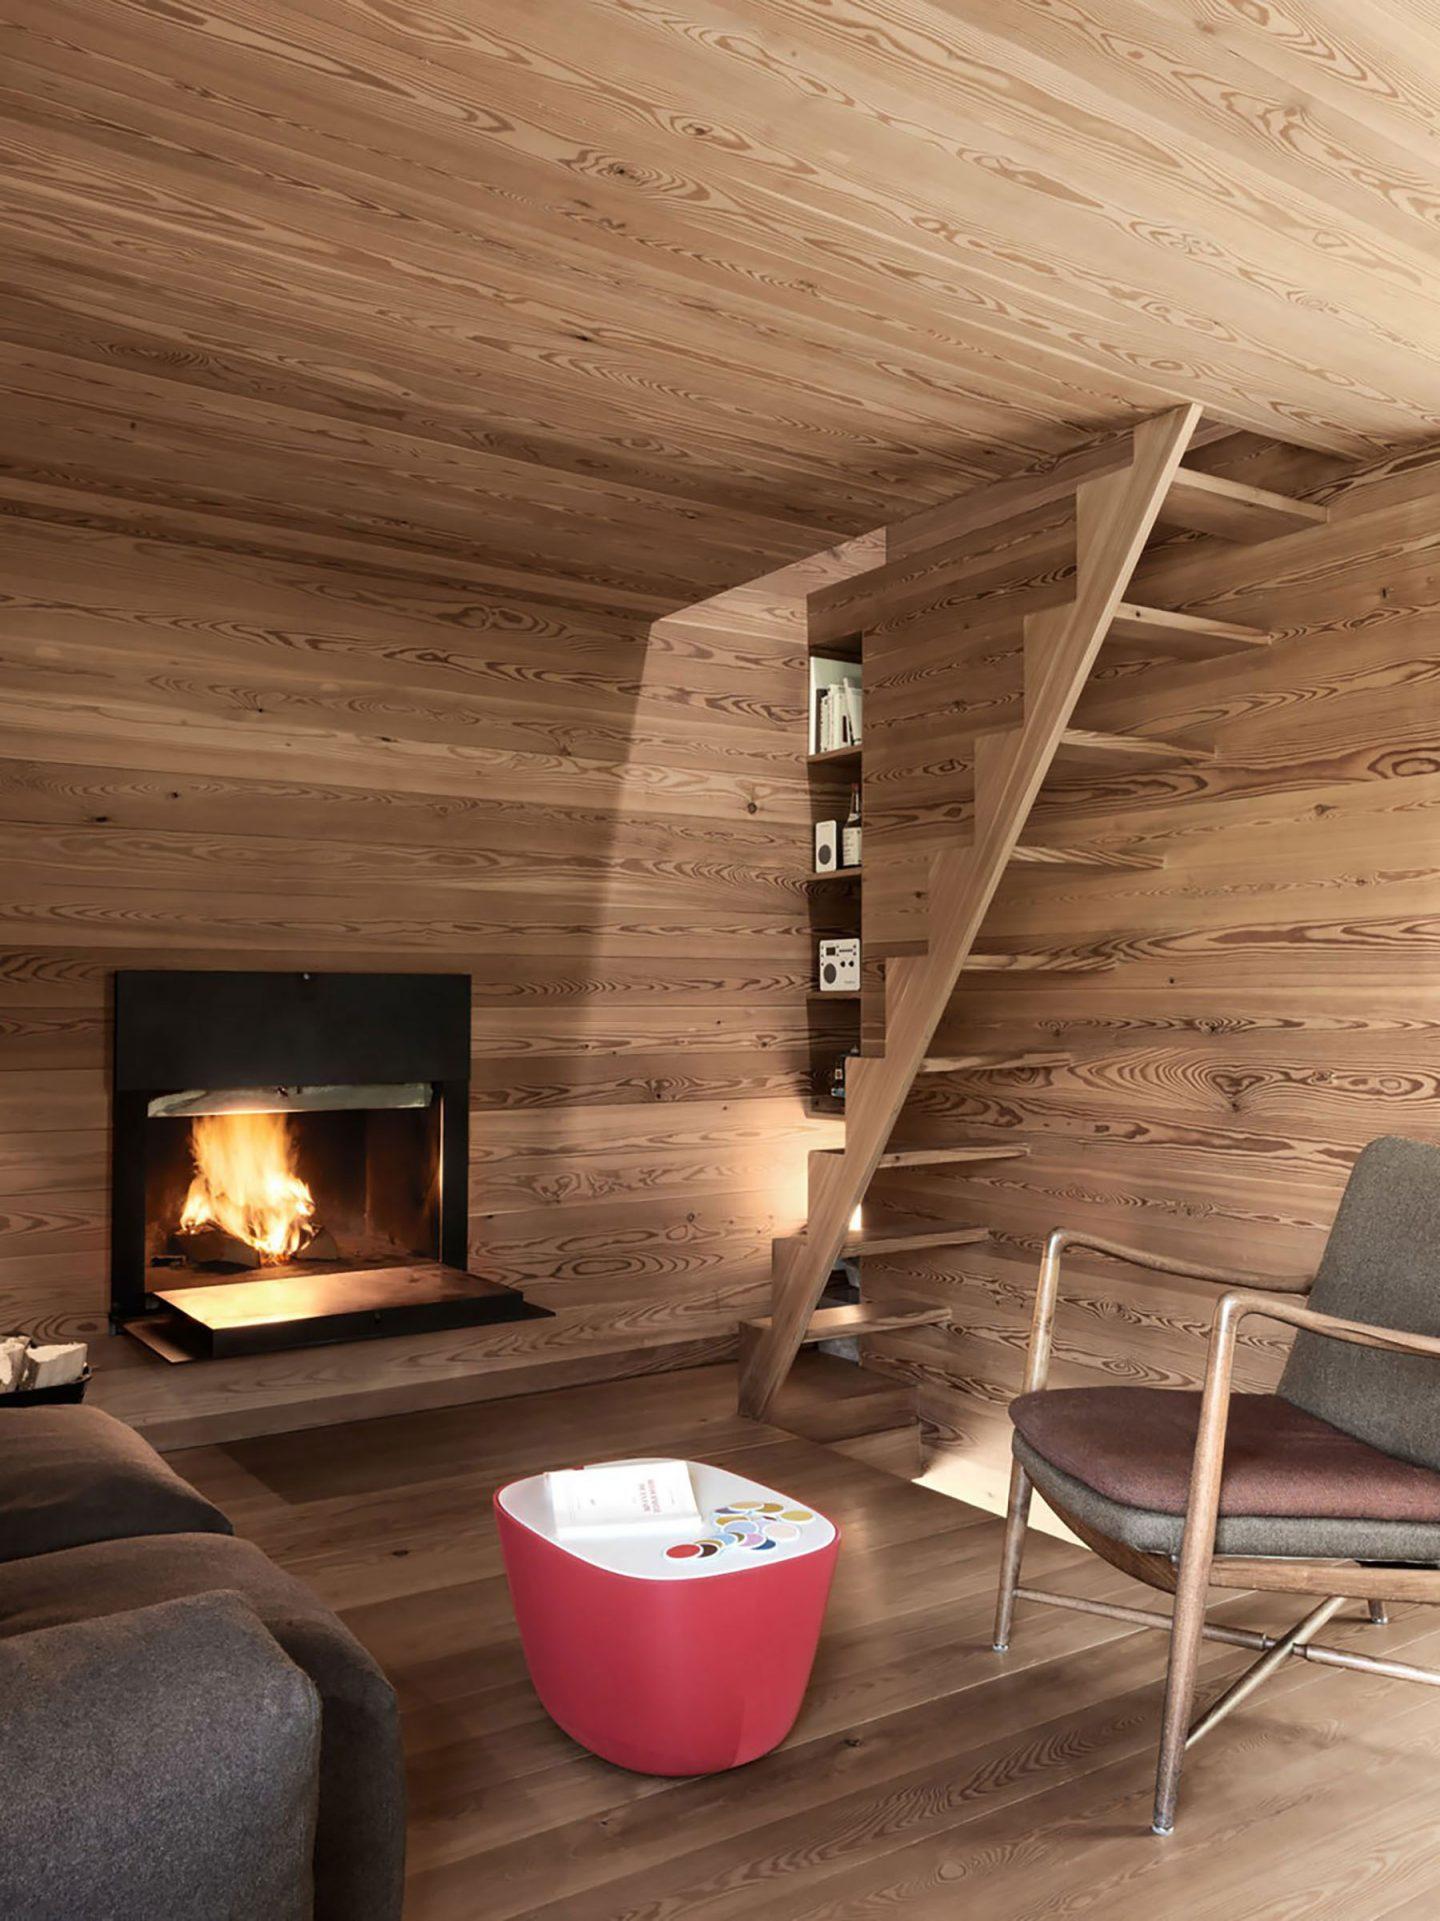 iGNANT-Architecture-Rapin-Saiz-Sarreyer-Cabin-07